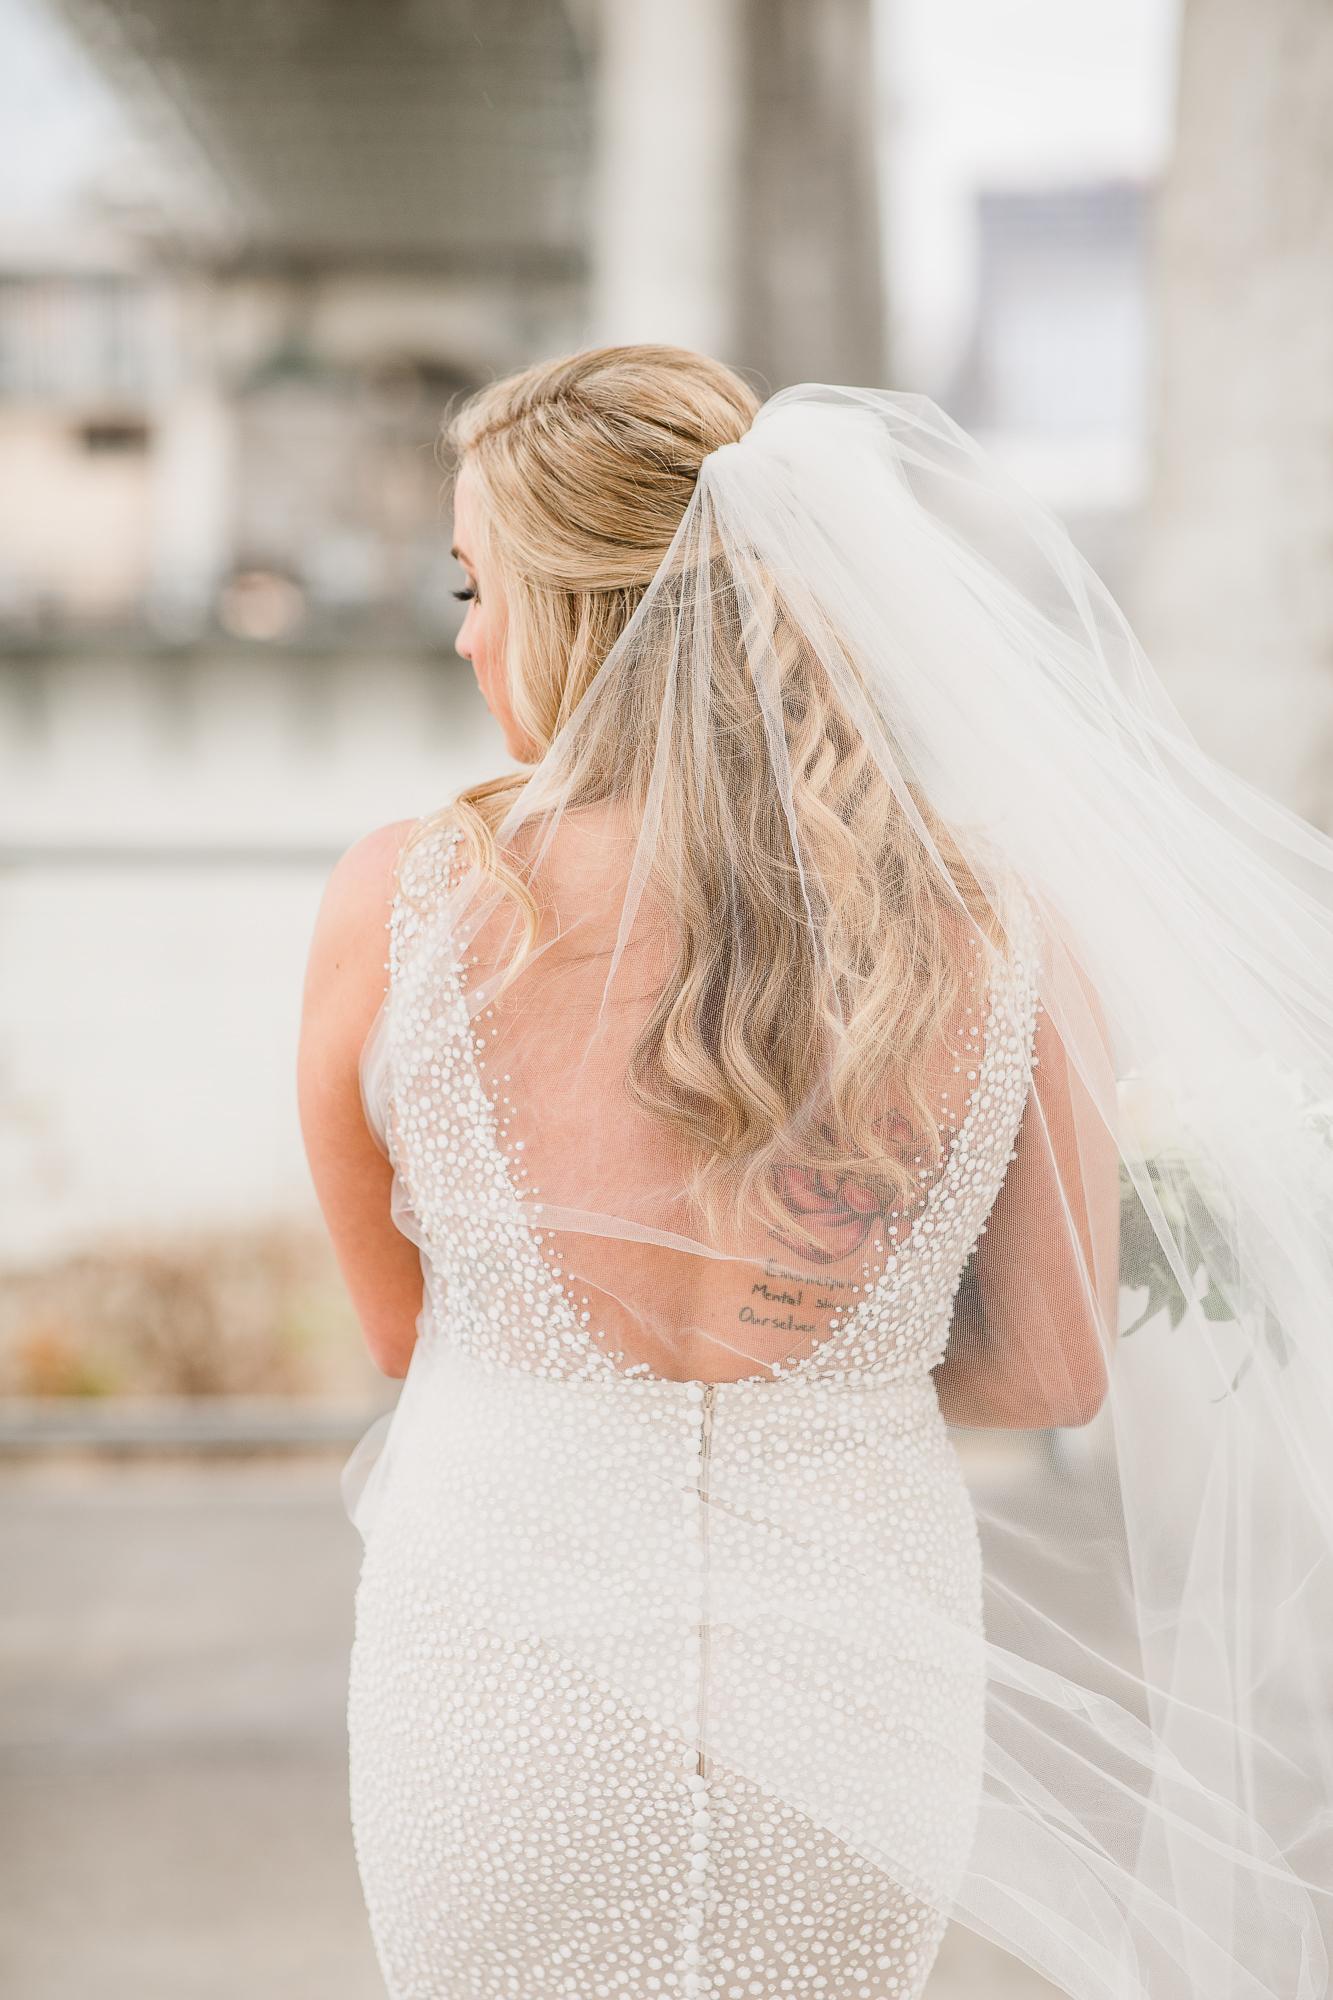 Pronovias Atelier Collection Wedding Dress   Nashville Bride Guide